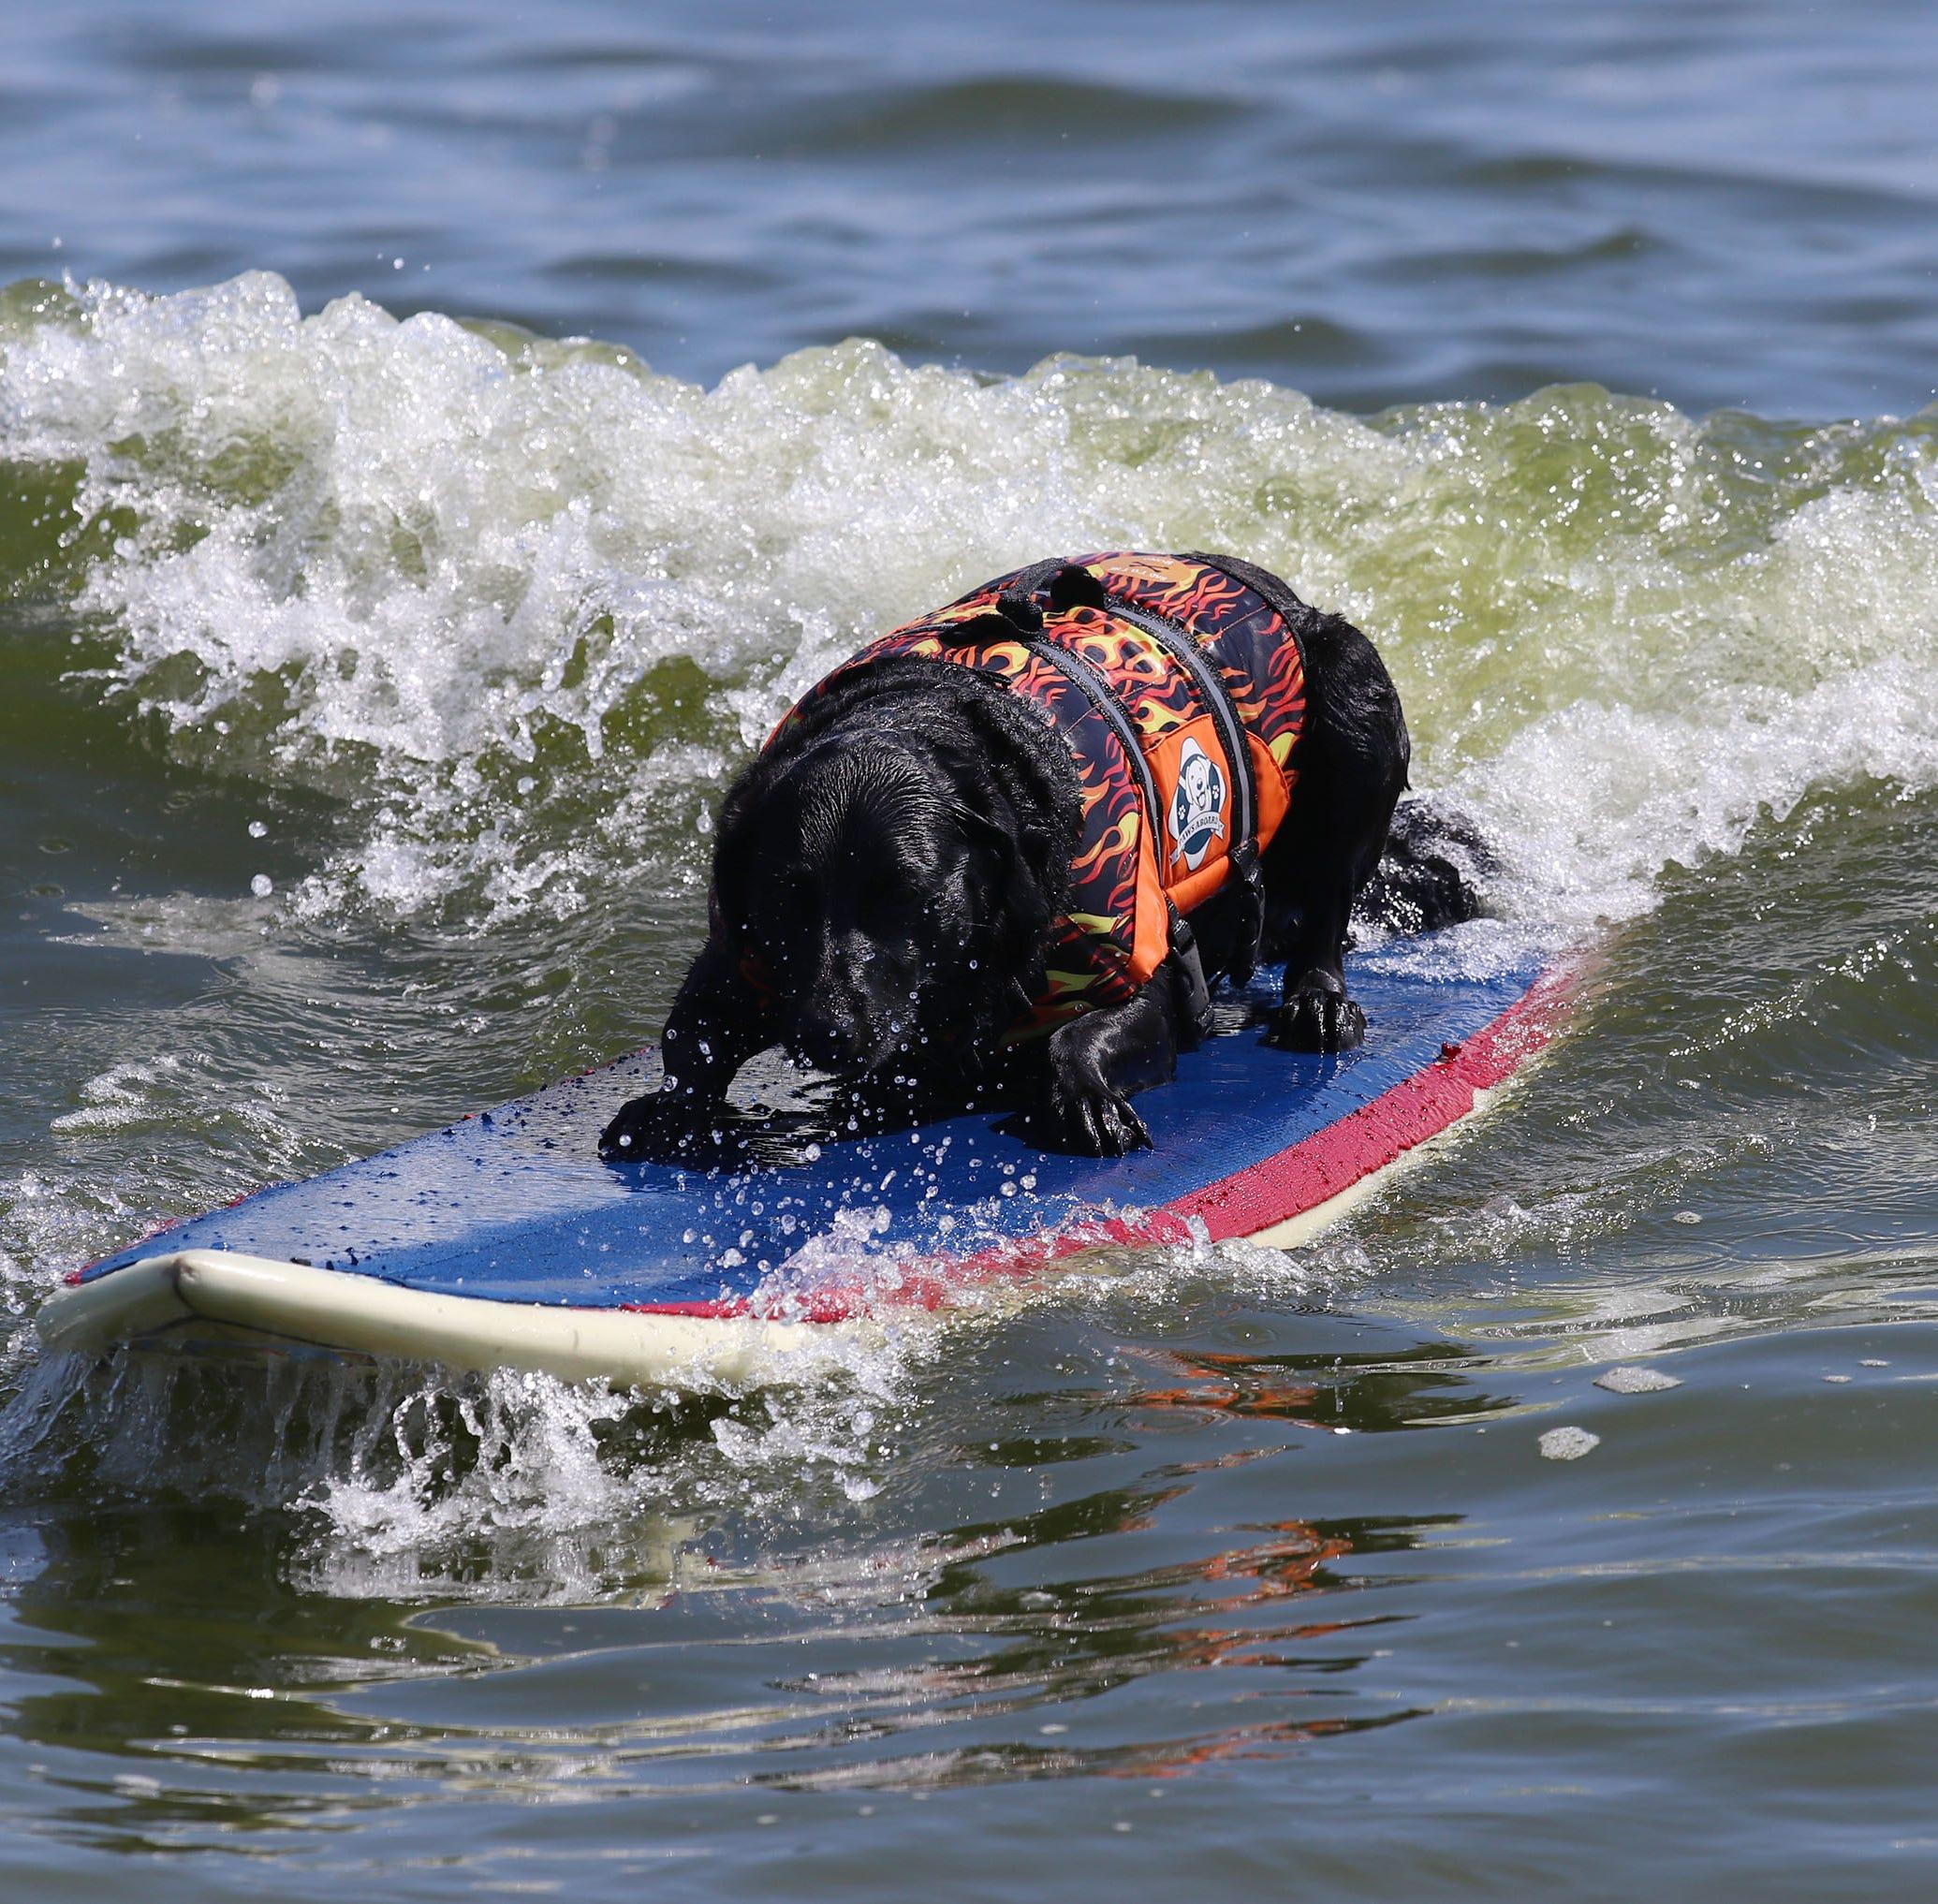 Overreaching at the beach: Bergmann